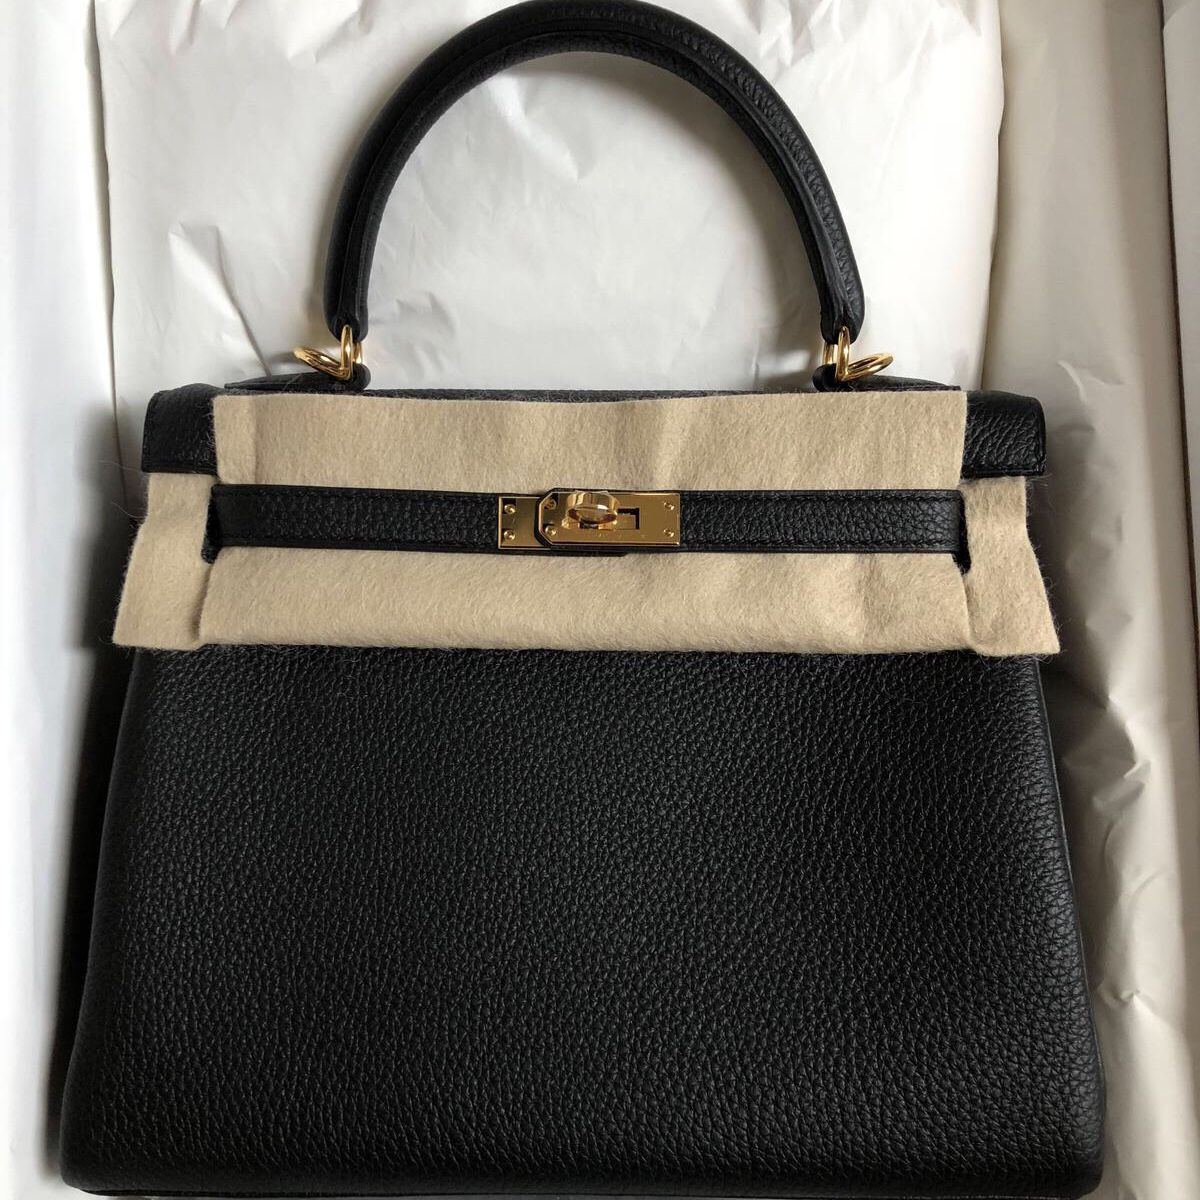 5739d9a1917b Hermès Kelly 25 Noir (Black) Togo Gold Hardware GHW C Stamp 2018  kelly25   thefrenchhunter  authenticonly  hermesworld  hermesusa  hermeseurope   hermesqatar ...